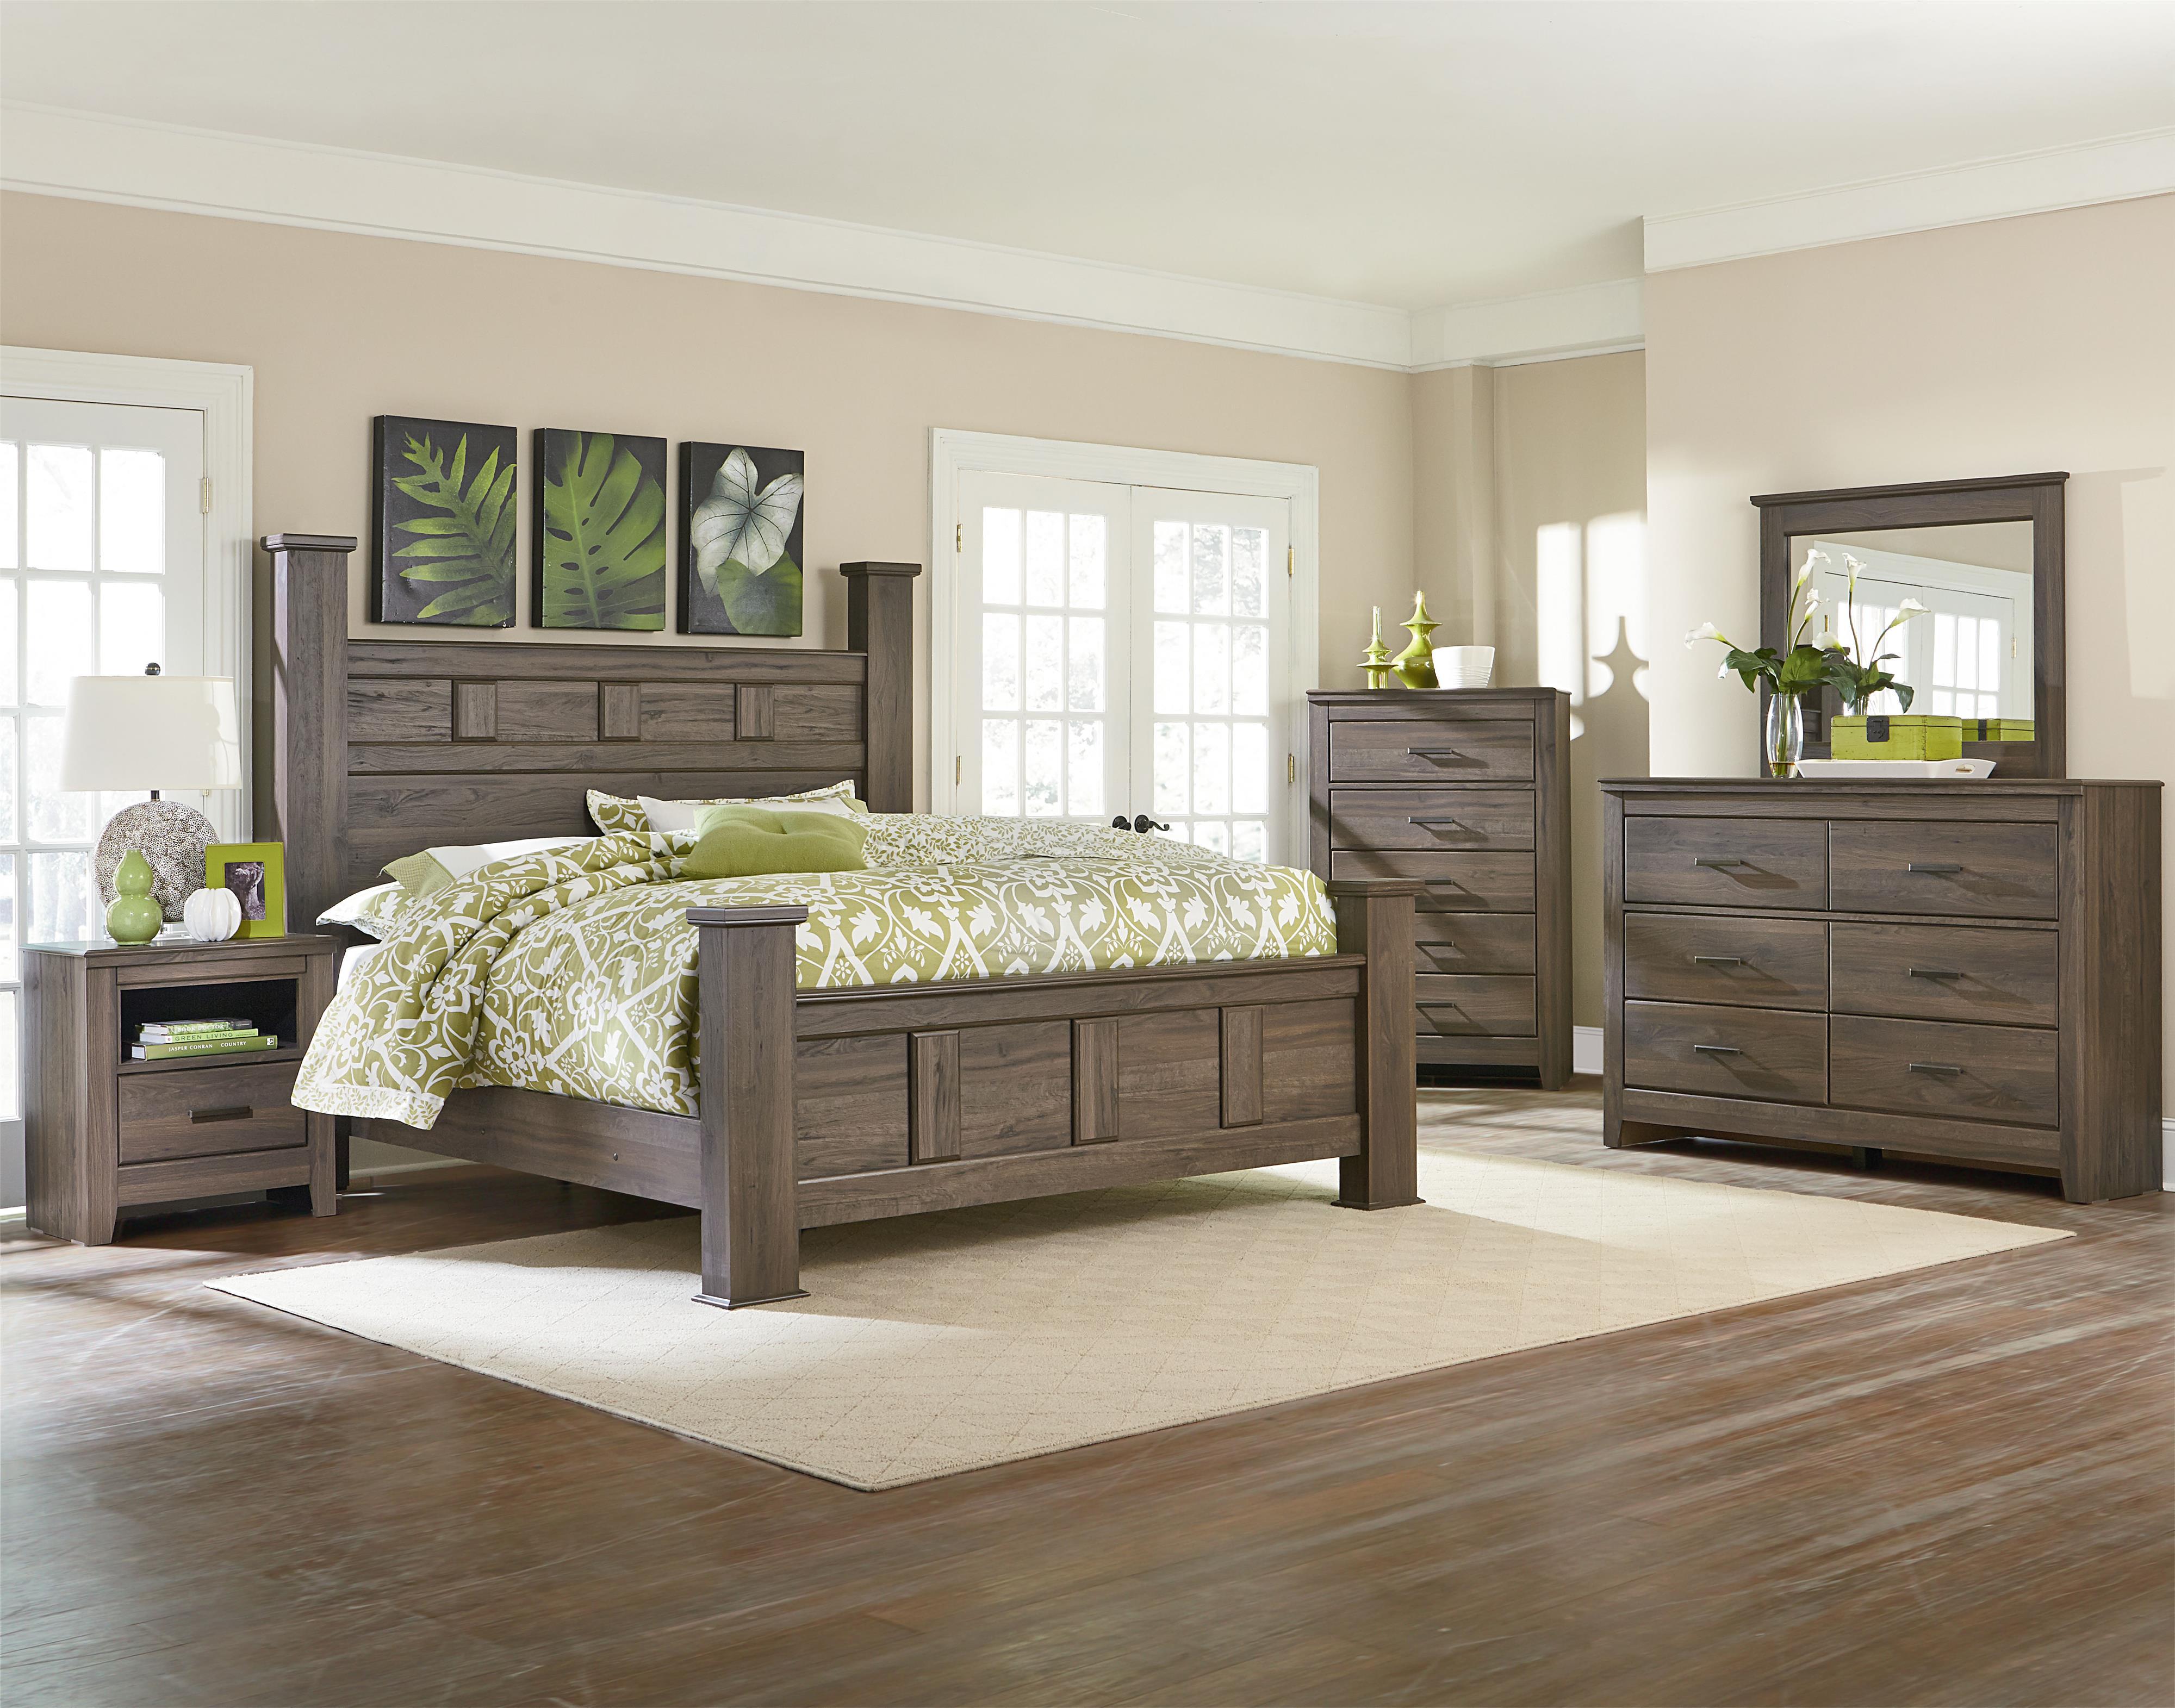 Standard Furniture Hayward King Bedroom Group - Item Number: 56510 K Bedroom Group 1